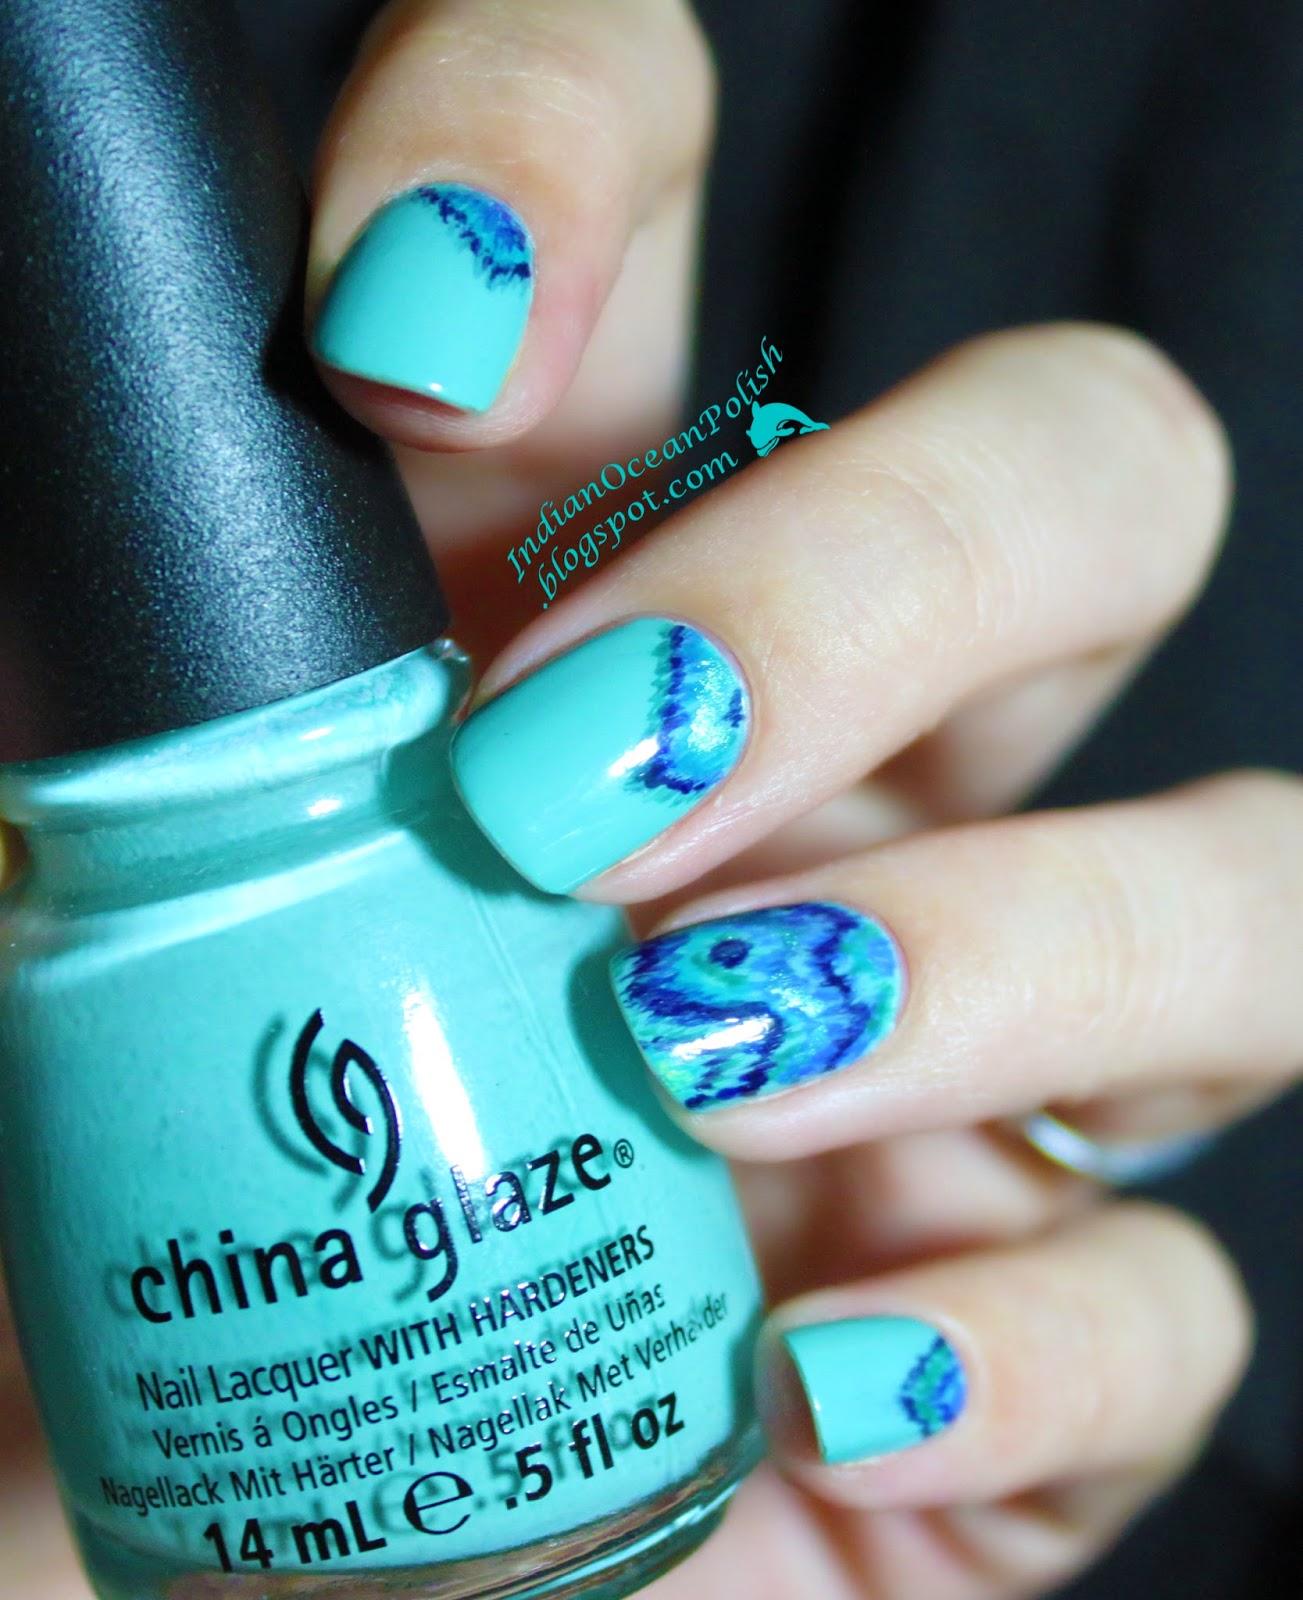 Indian Ocean Polish Colour Blocking Nails With Opi Fly: Indian Ocean Polish: Turquoise And Ocean Coloured Ikat